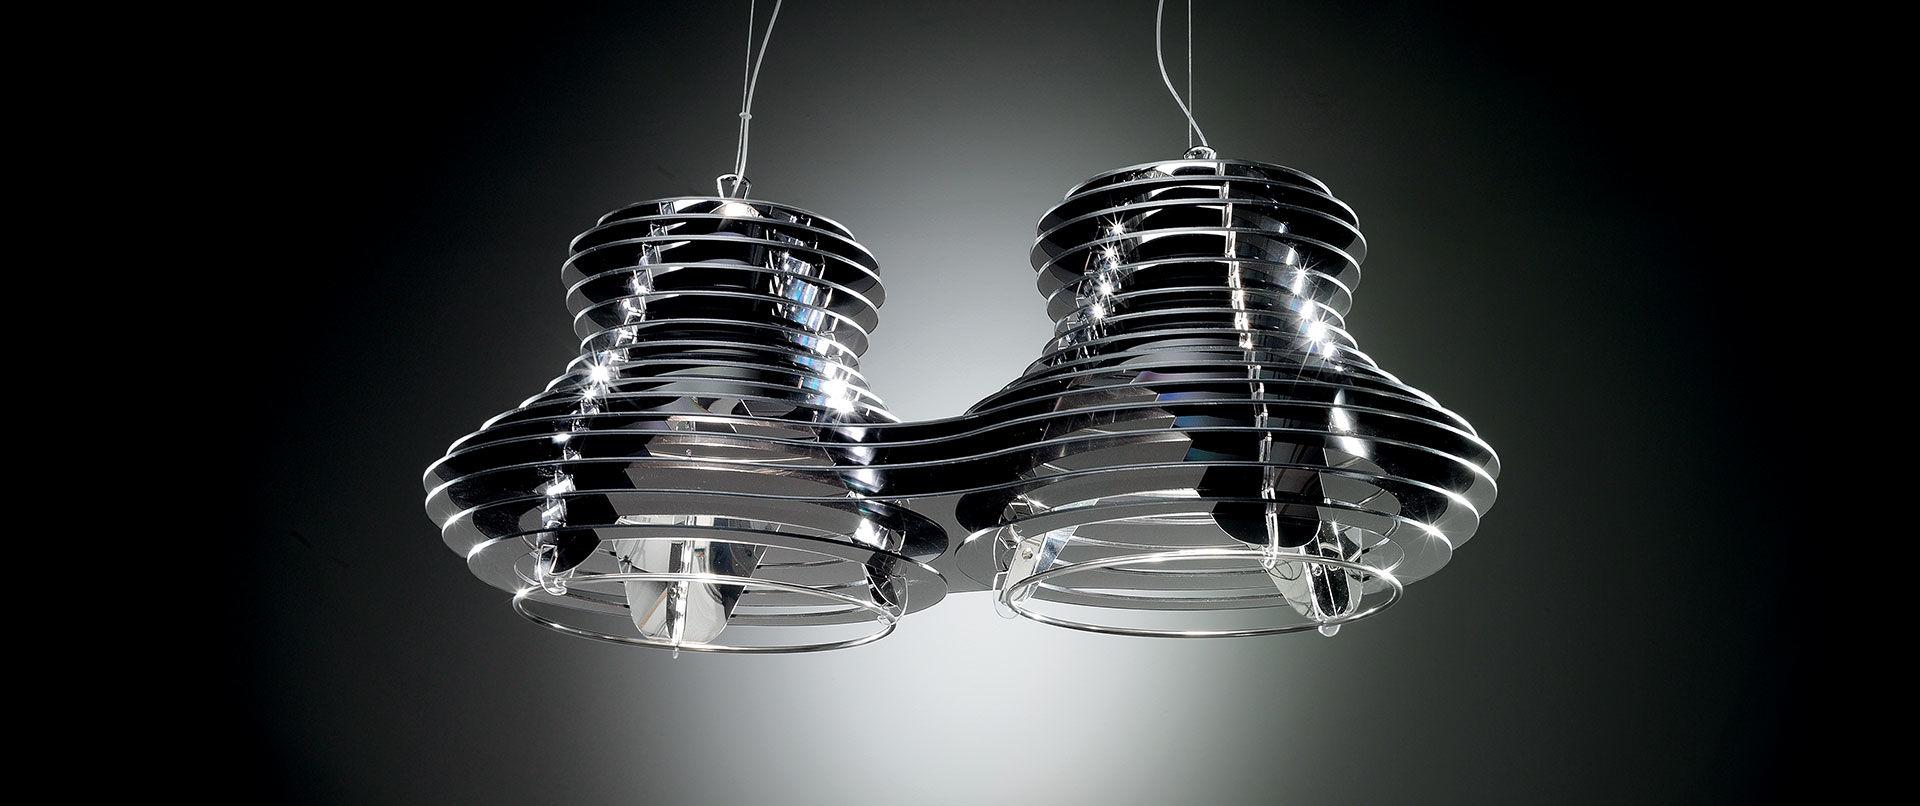 Fresnel Glass Restoration Bath Light: Opalflex Lentiflex Lamps